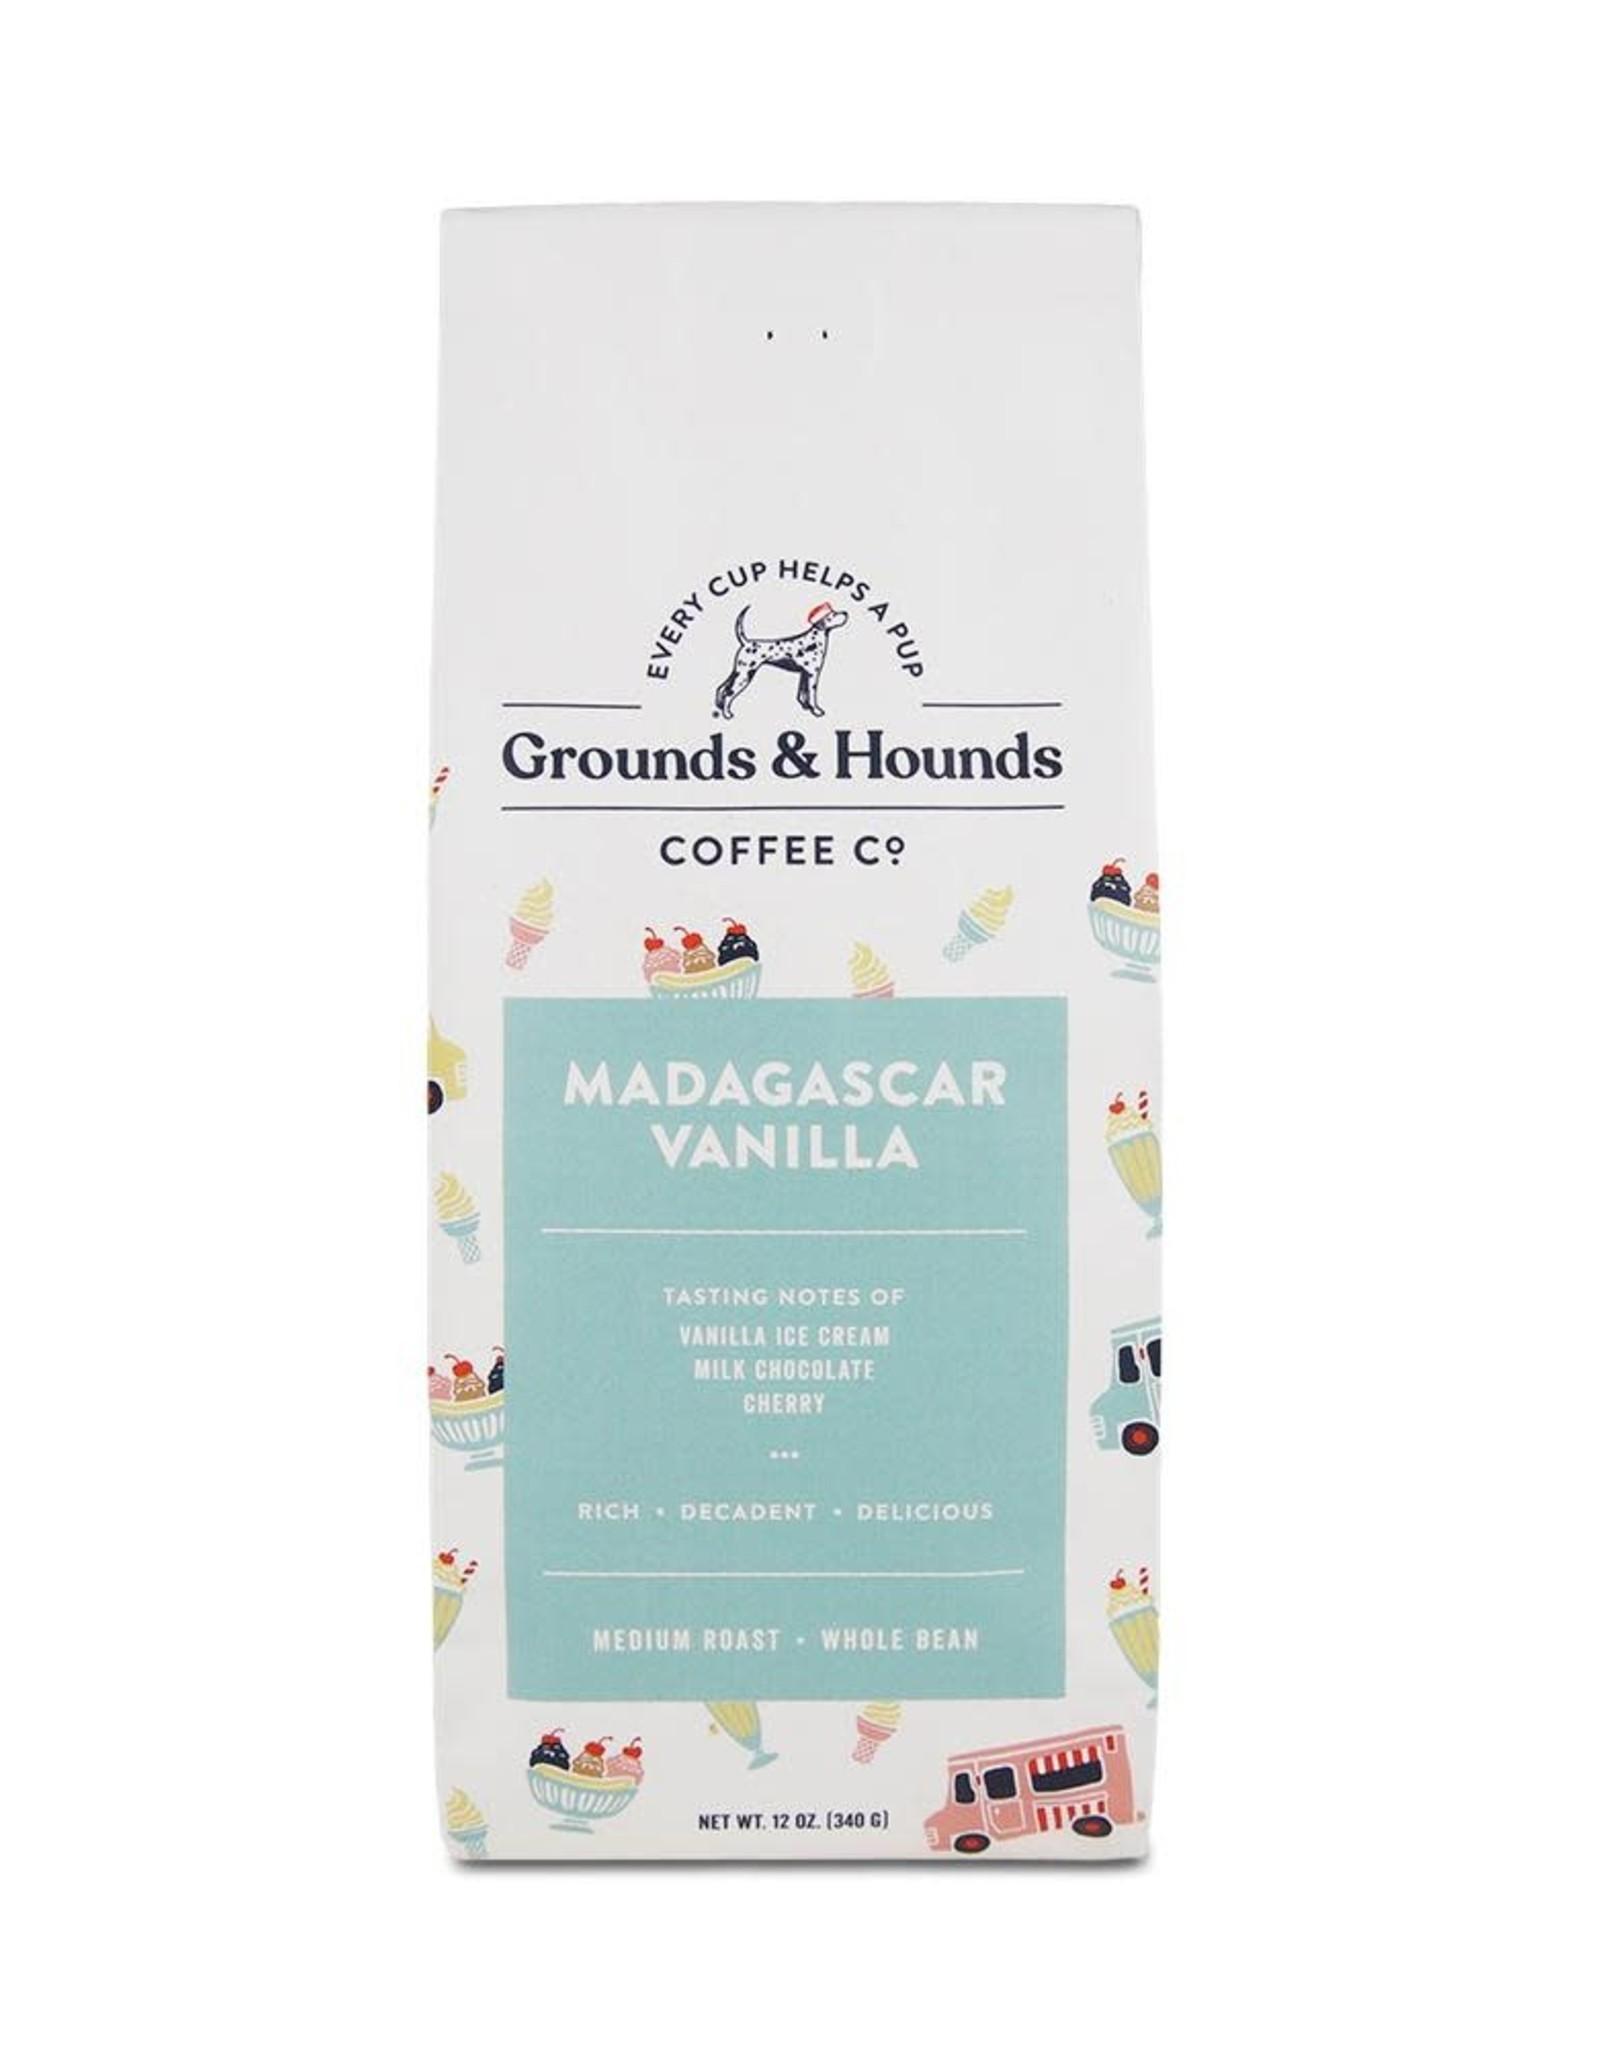 Grounds & Hounds Ground Coffee - Madagascar Vanilla